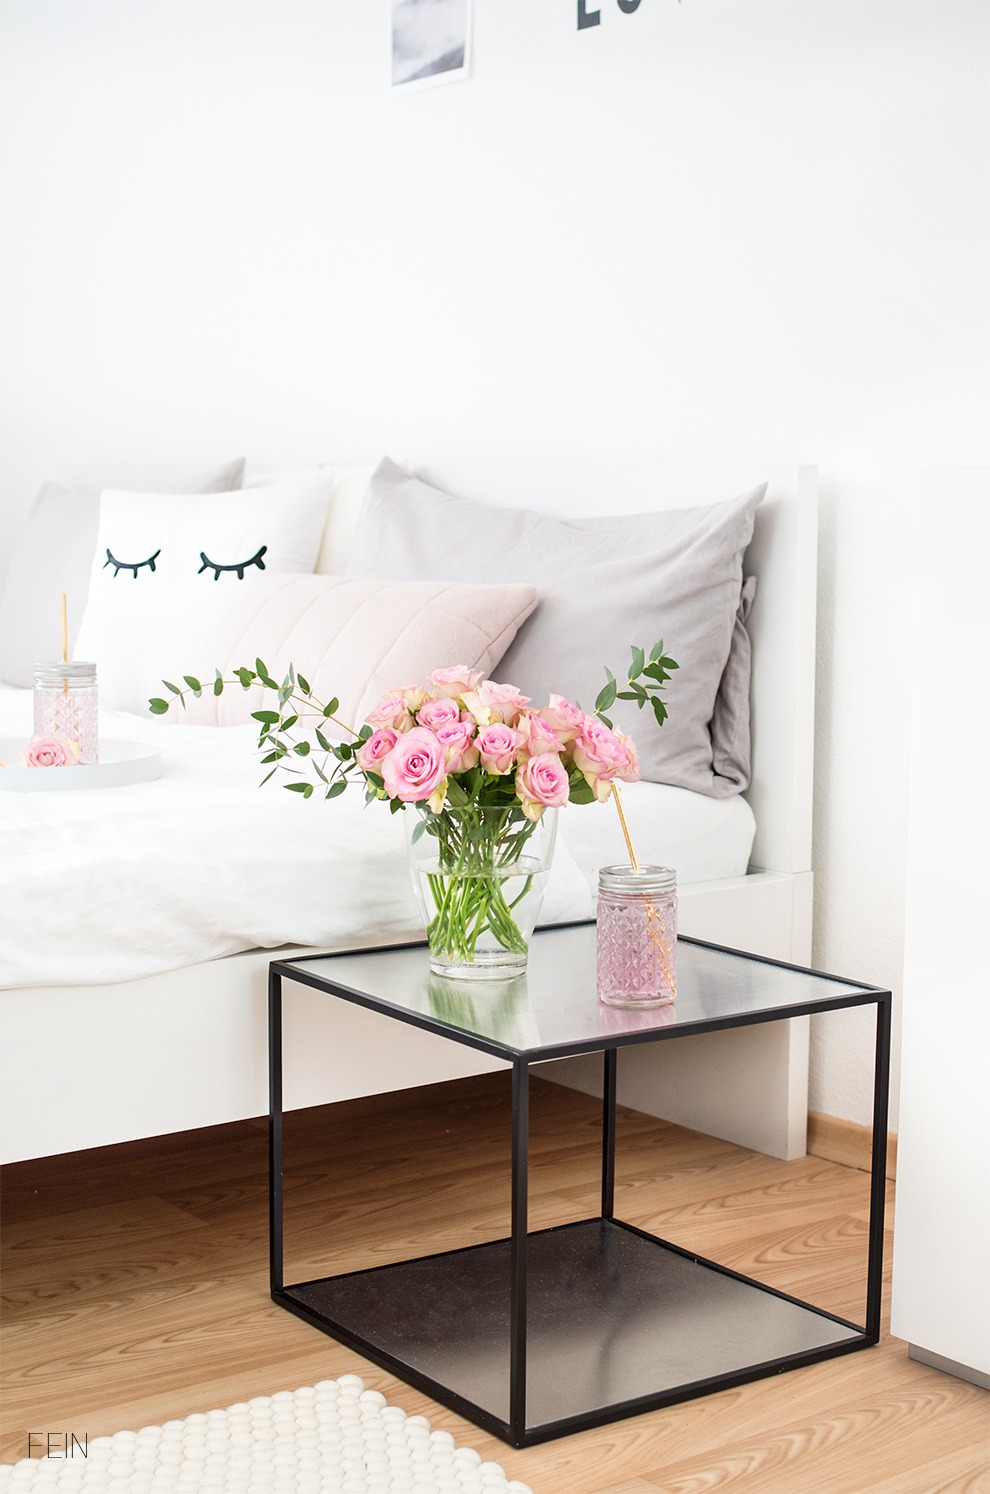 rosa-accessoires-feminin-schlafzimmer-kissen